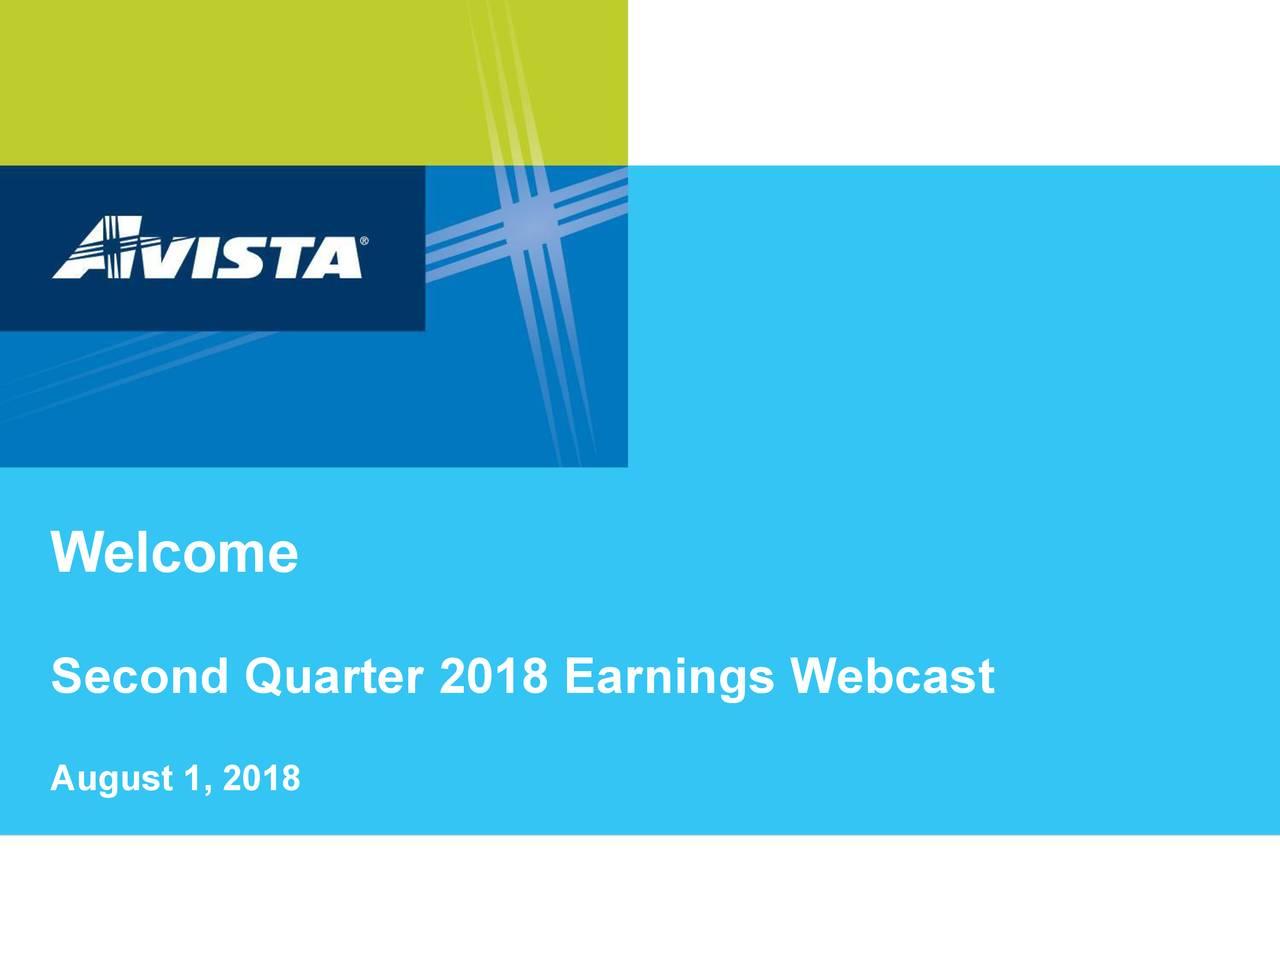 Second Quarter 2018 Earnings Webcast August 1, 2018